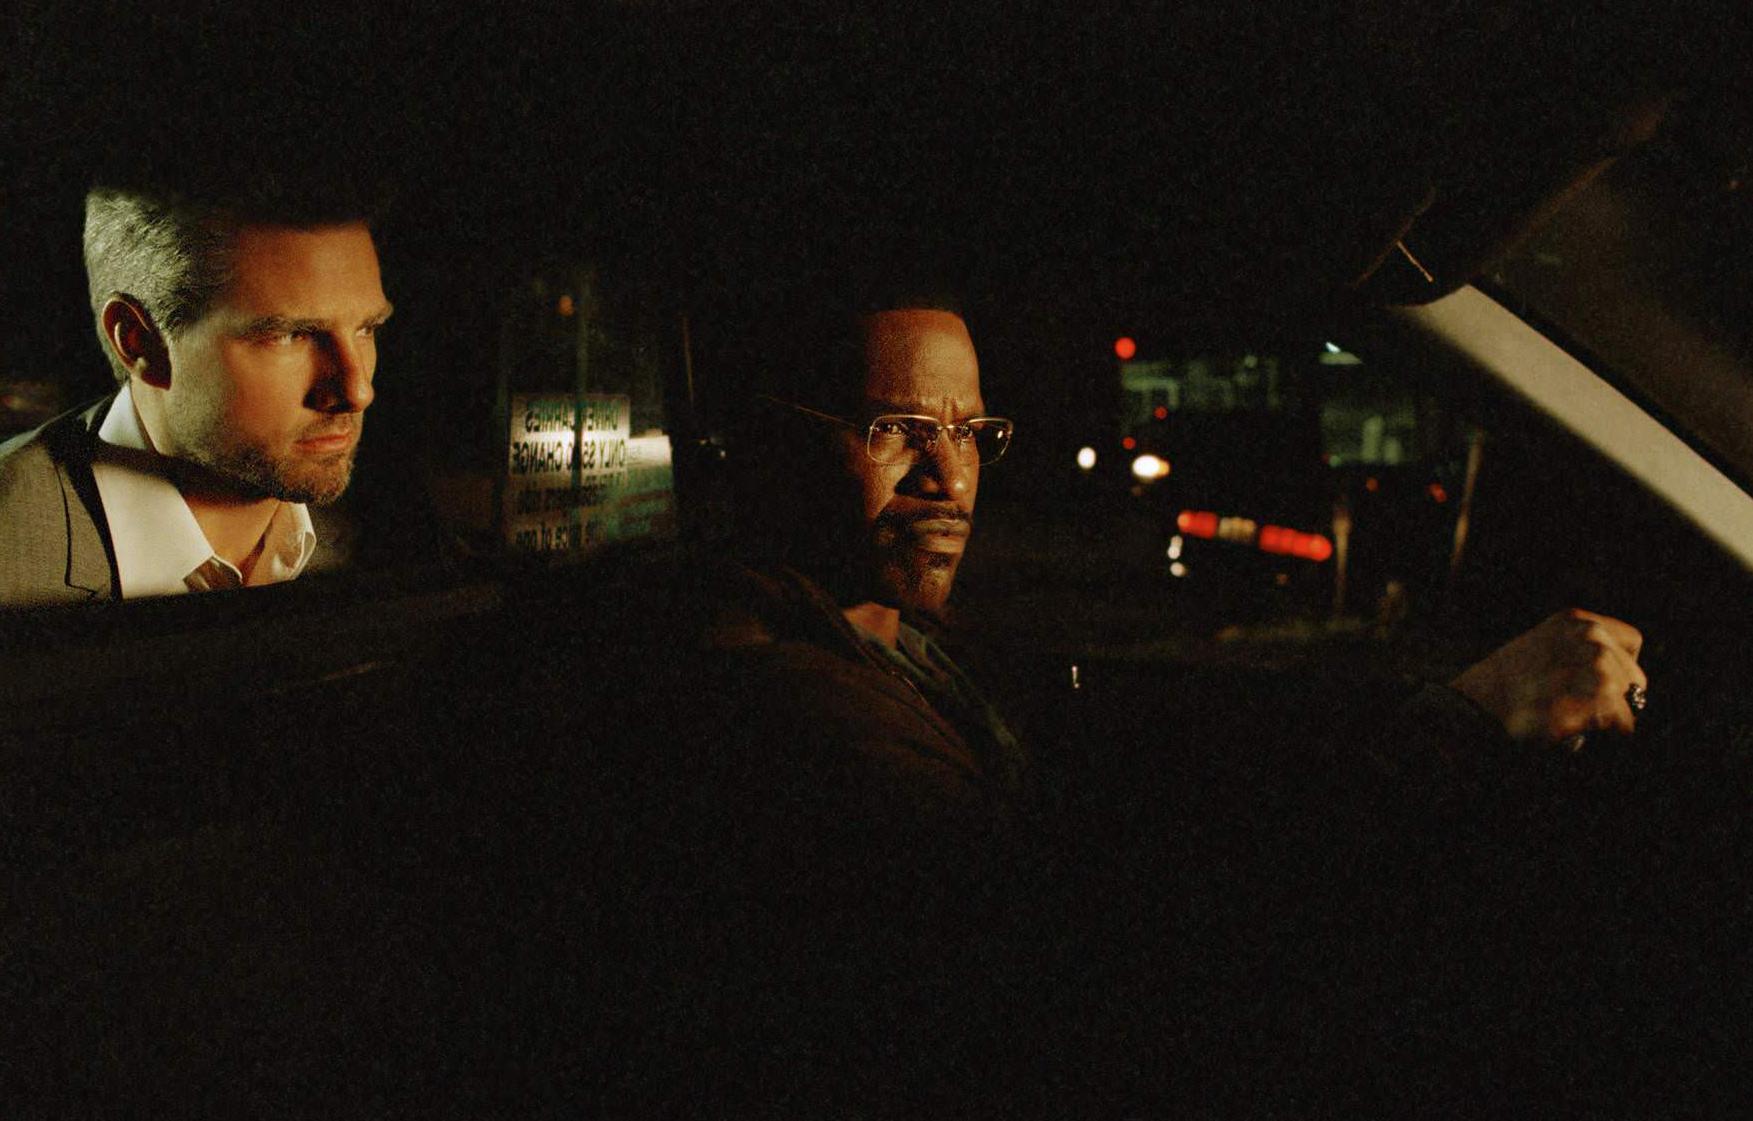 L.A. Breakdown, a Hitman In Crisis: Michael Mann's 'Collateral'